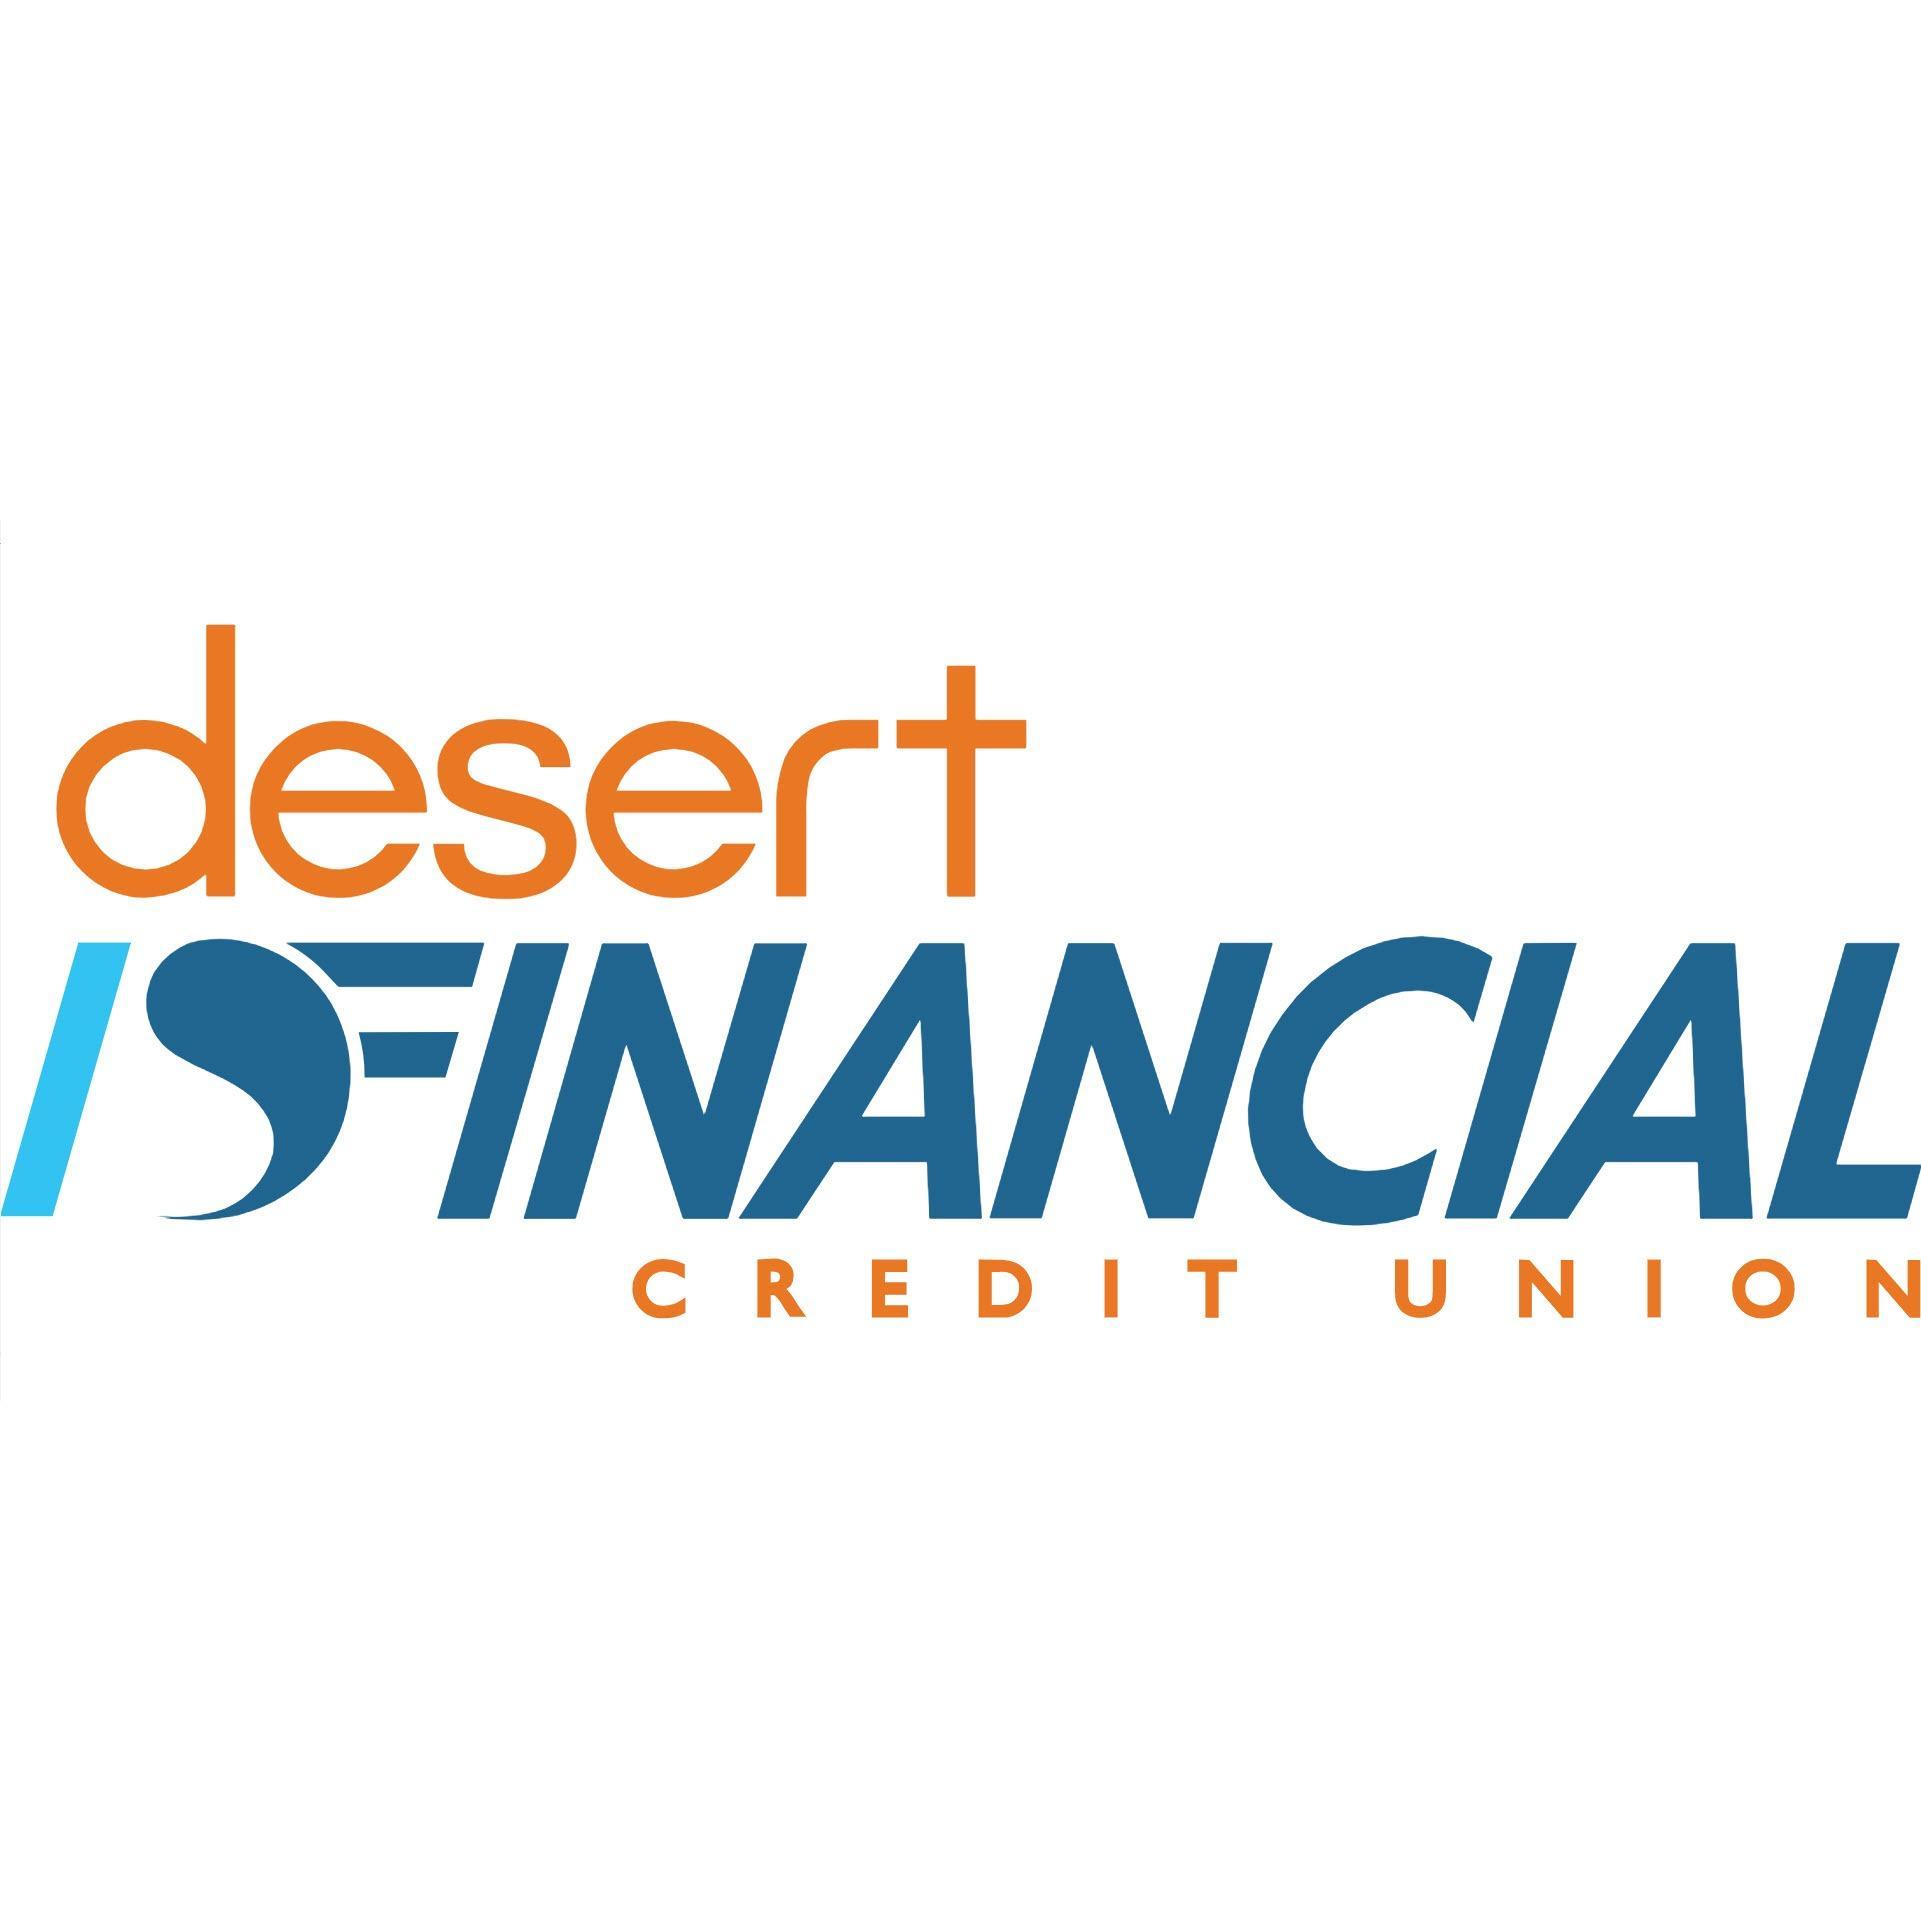 Desert Financial Credit Union - Phoenix, AZ - Credit Unions